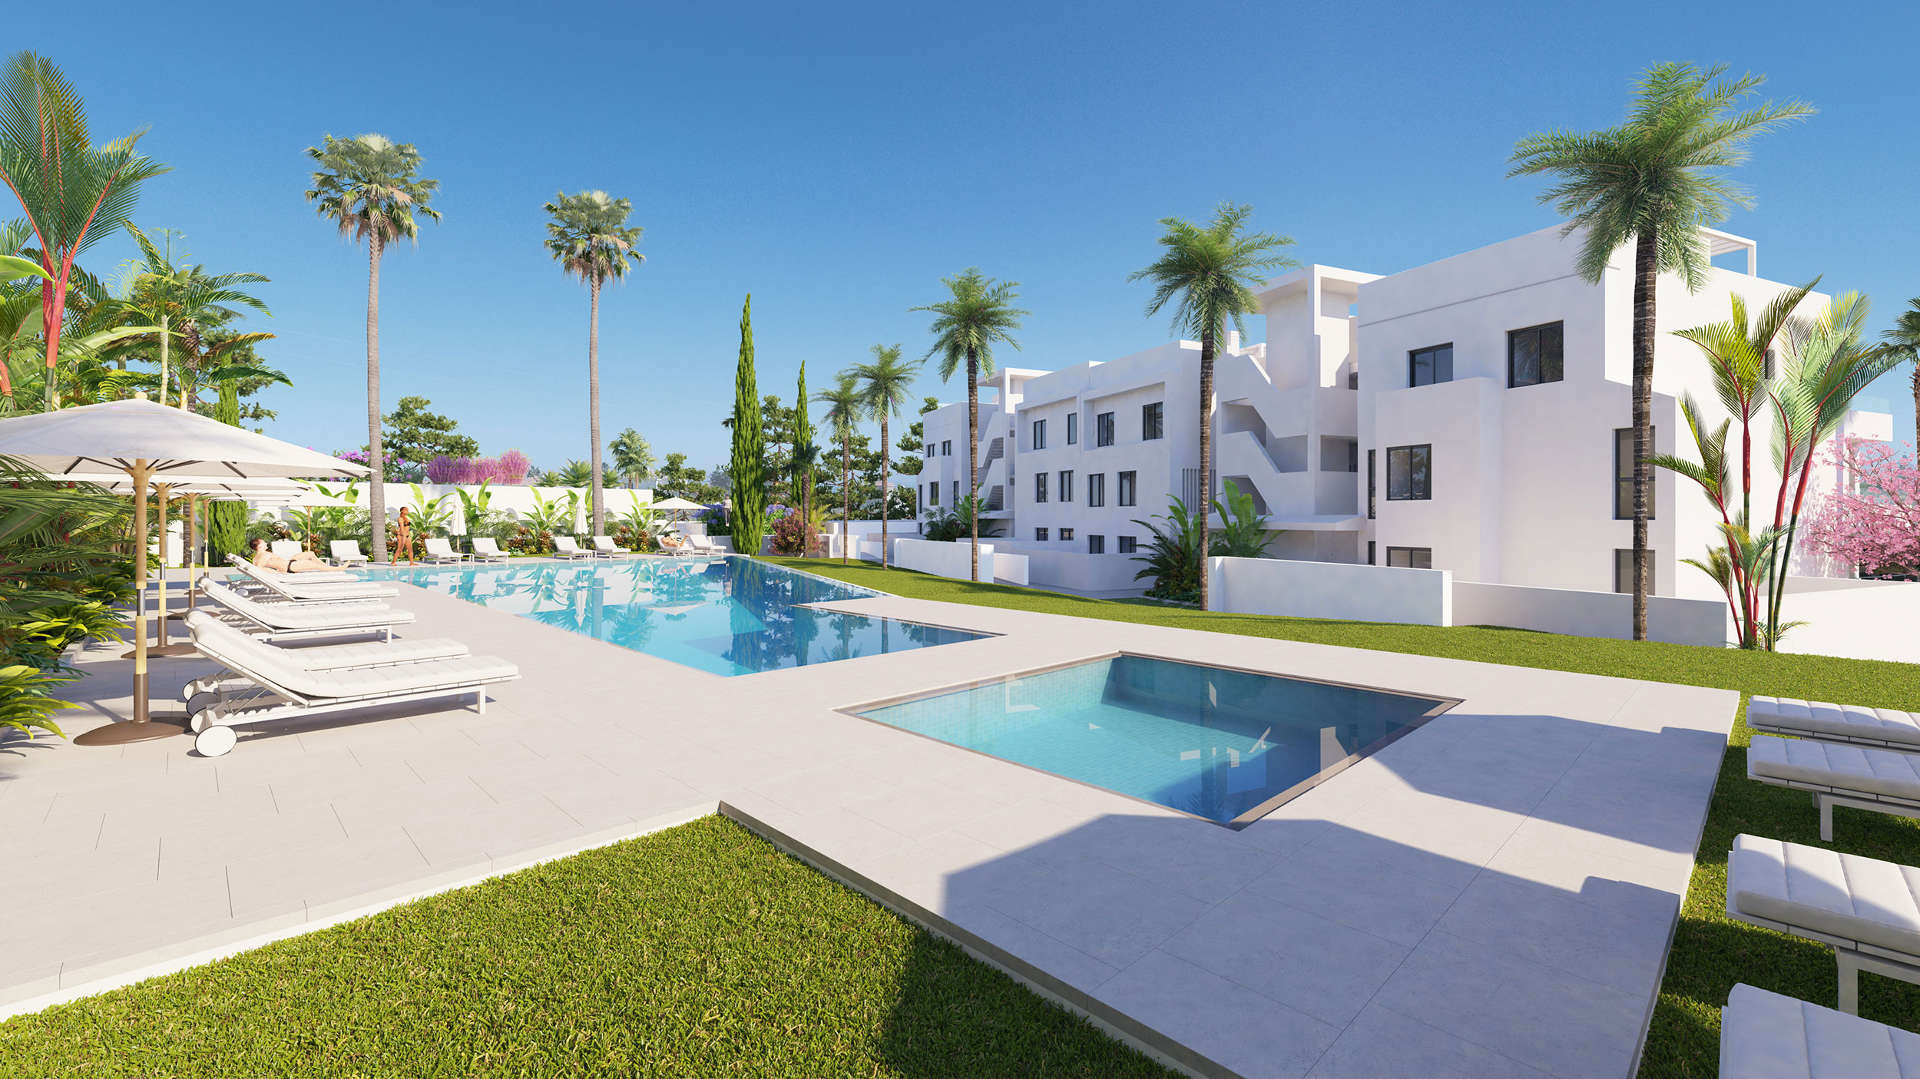 Las Olas Estepona For Sale New Development Apartment Penthouse_Realista  Quality Properties Marbella